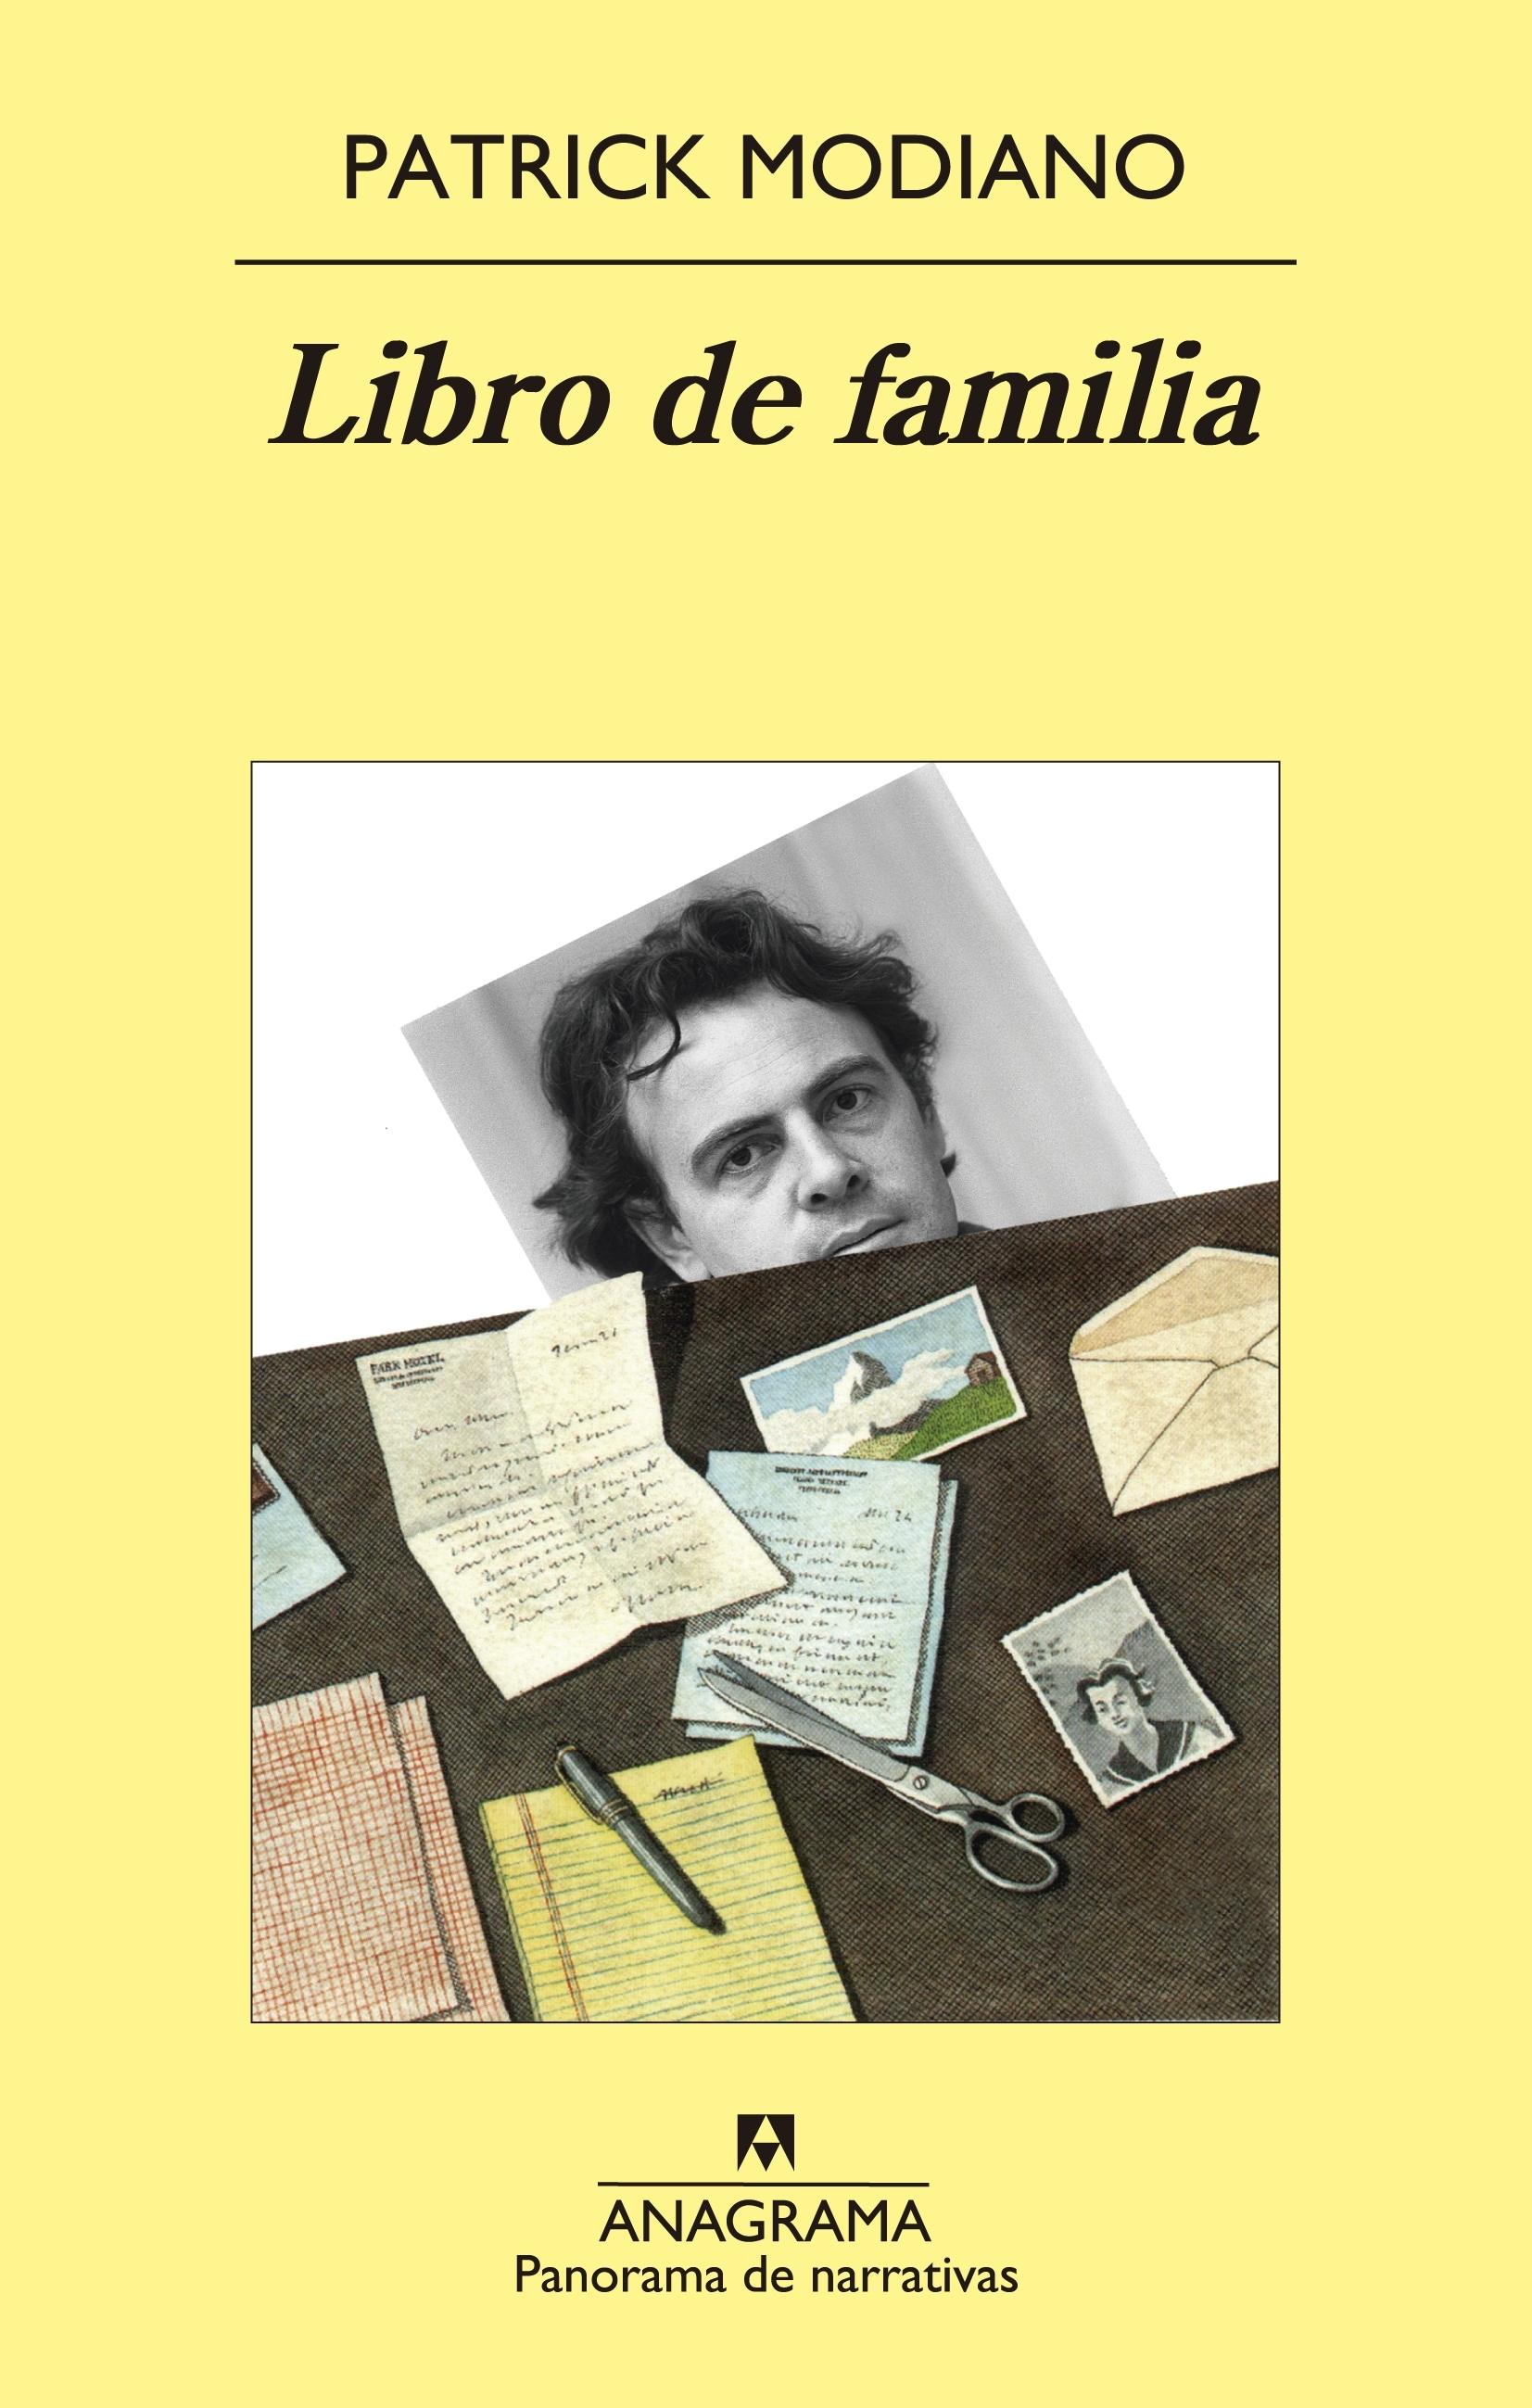 Libro de familia - Editorial Anagrama